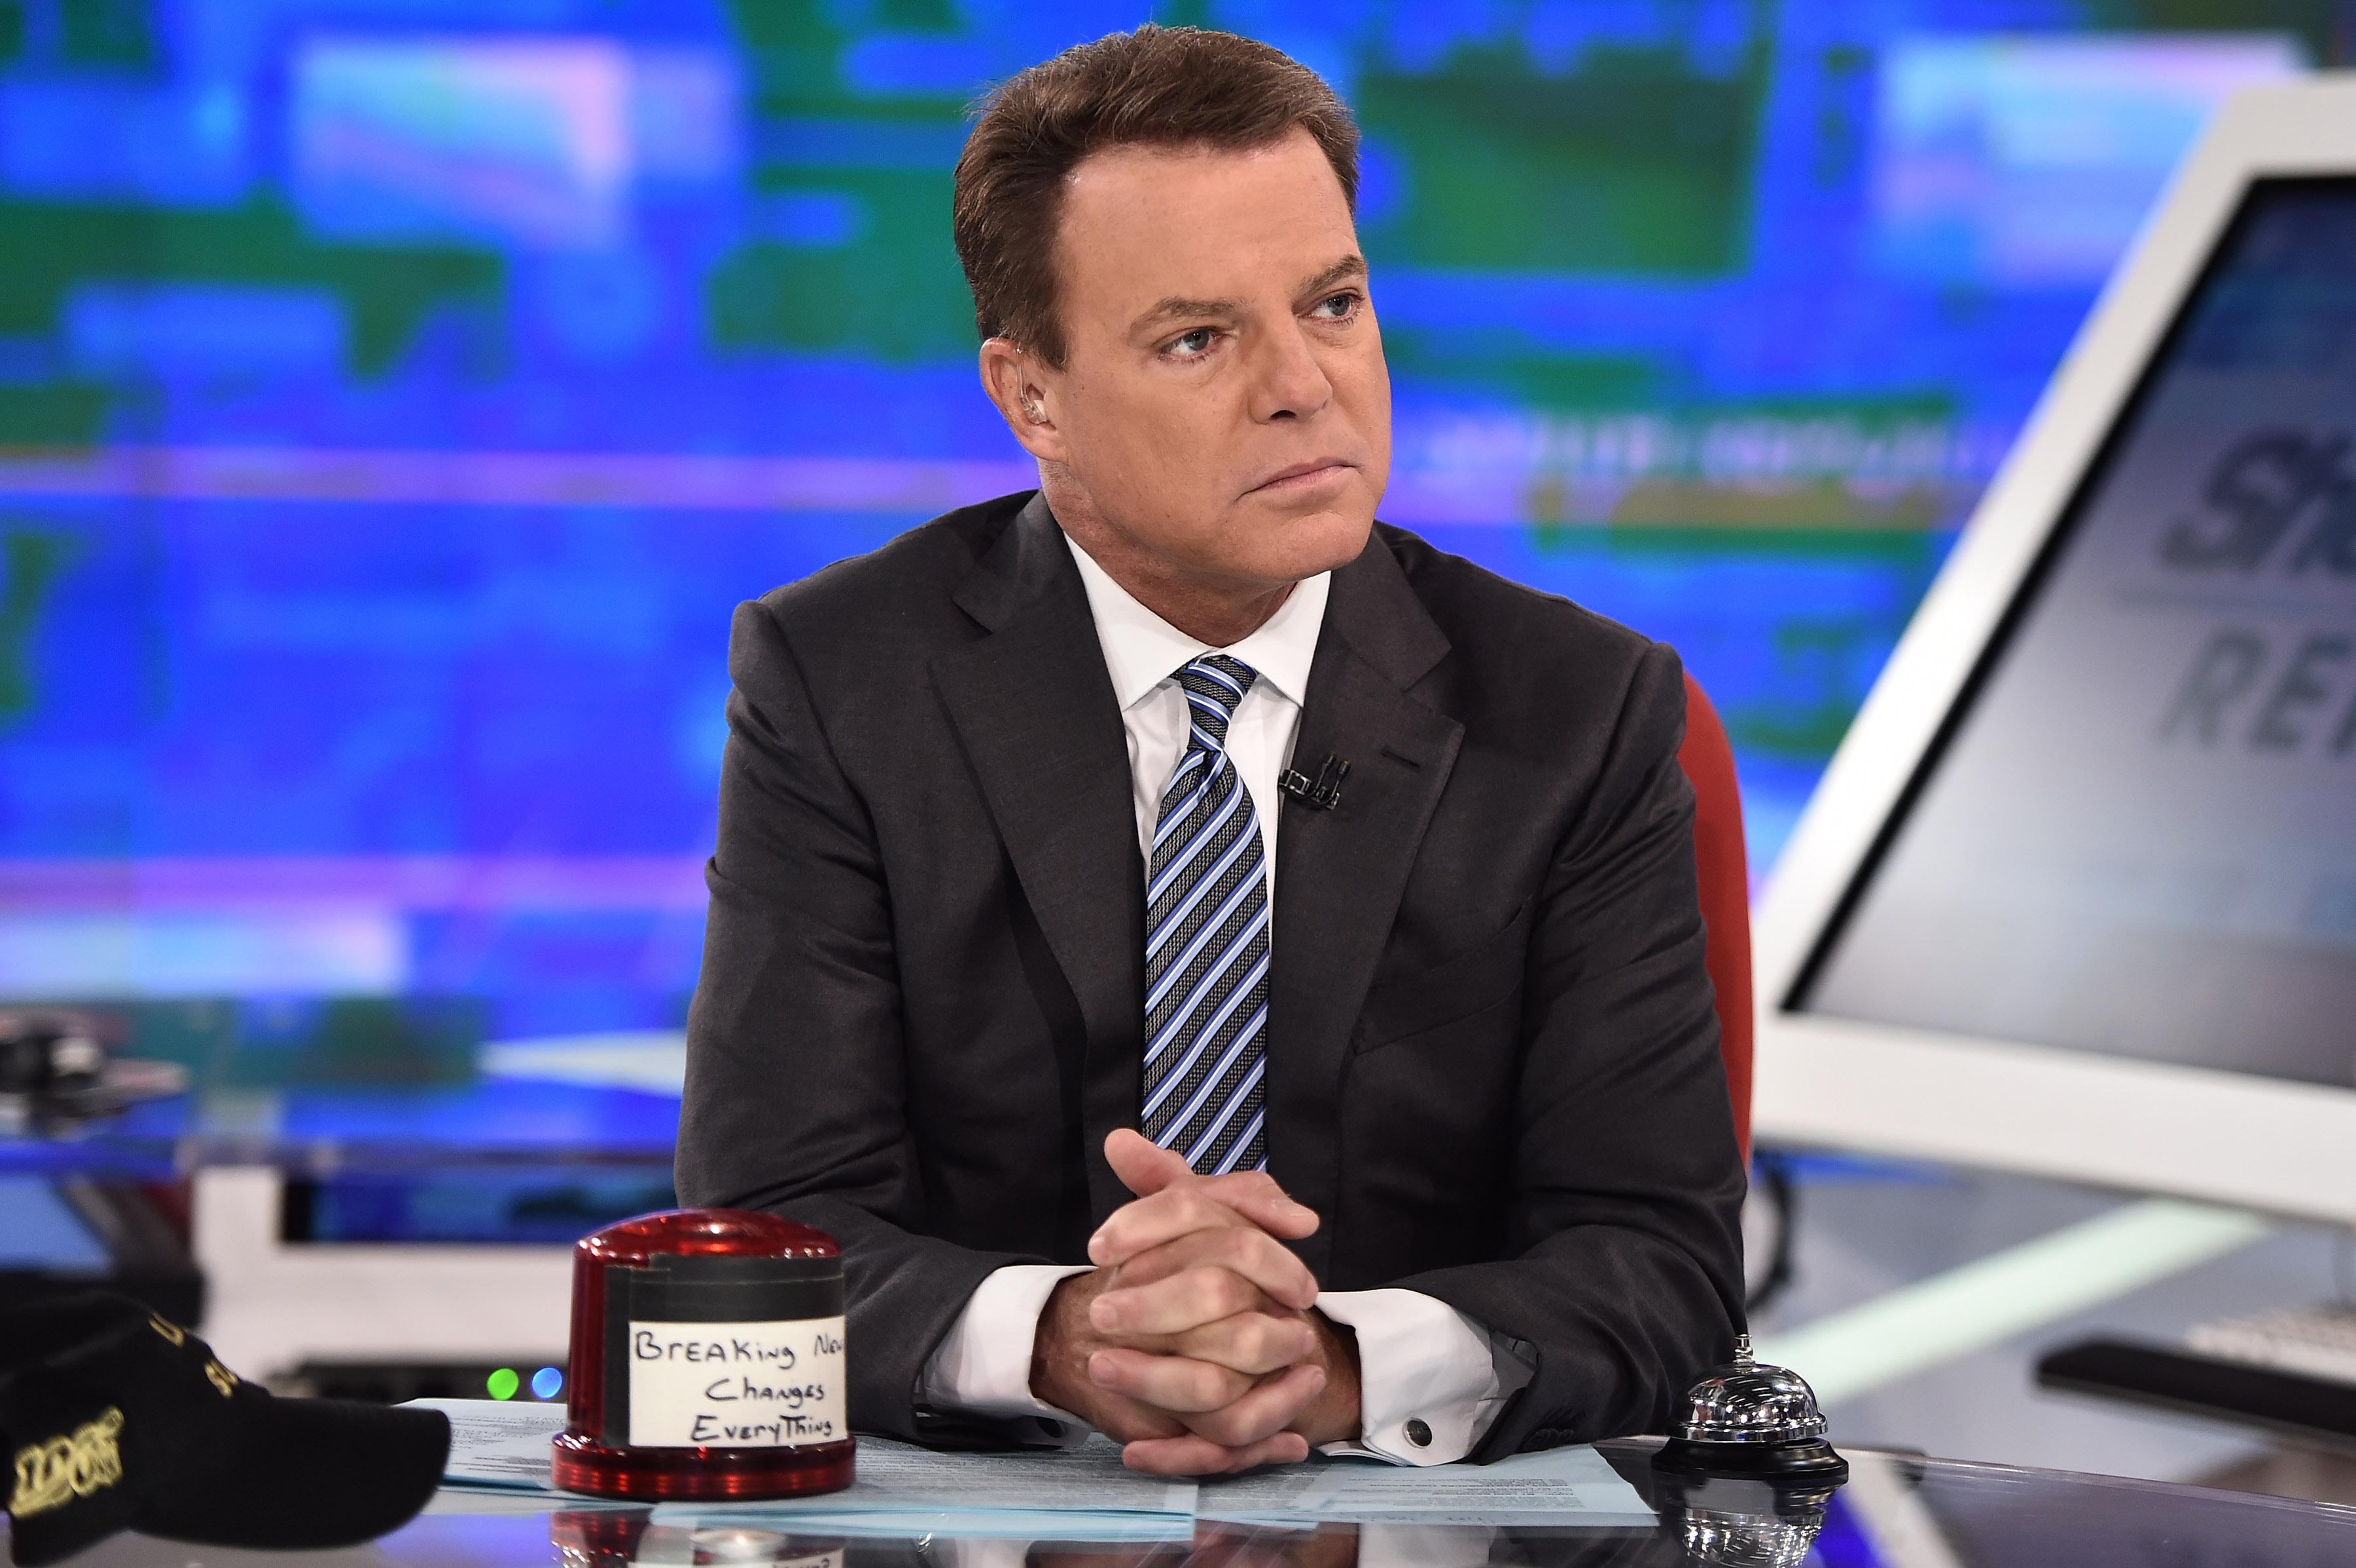 Shepard Smith is leaving Fox News